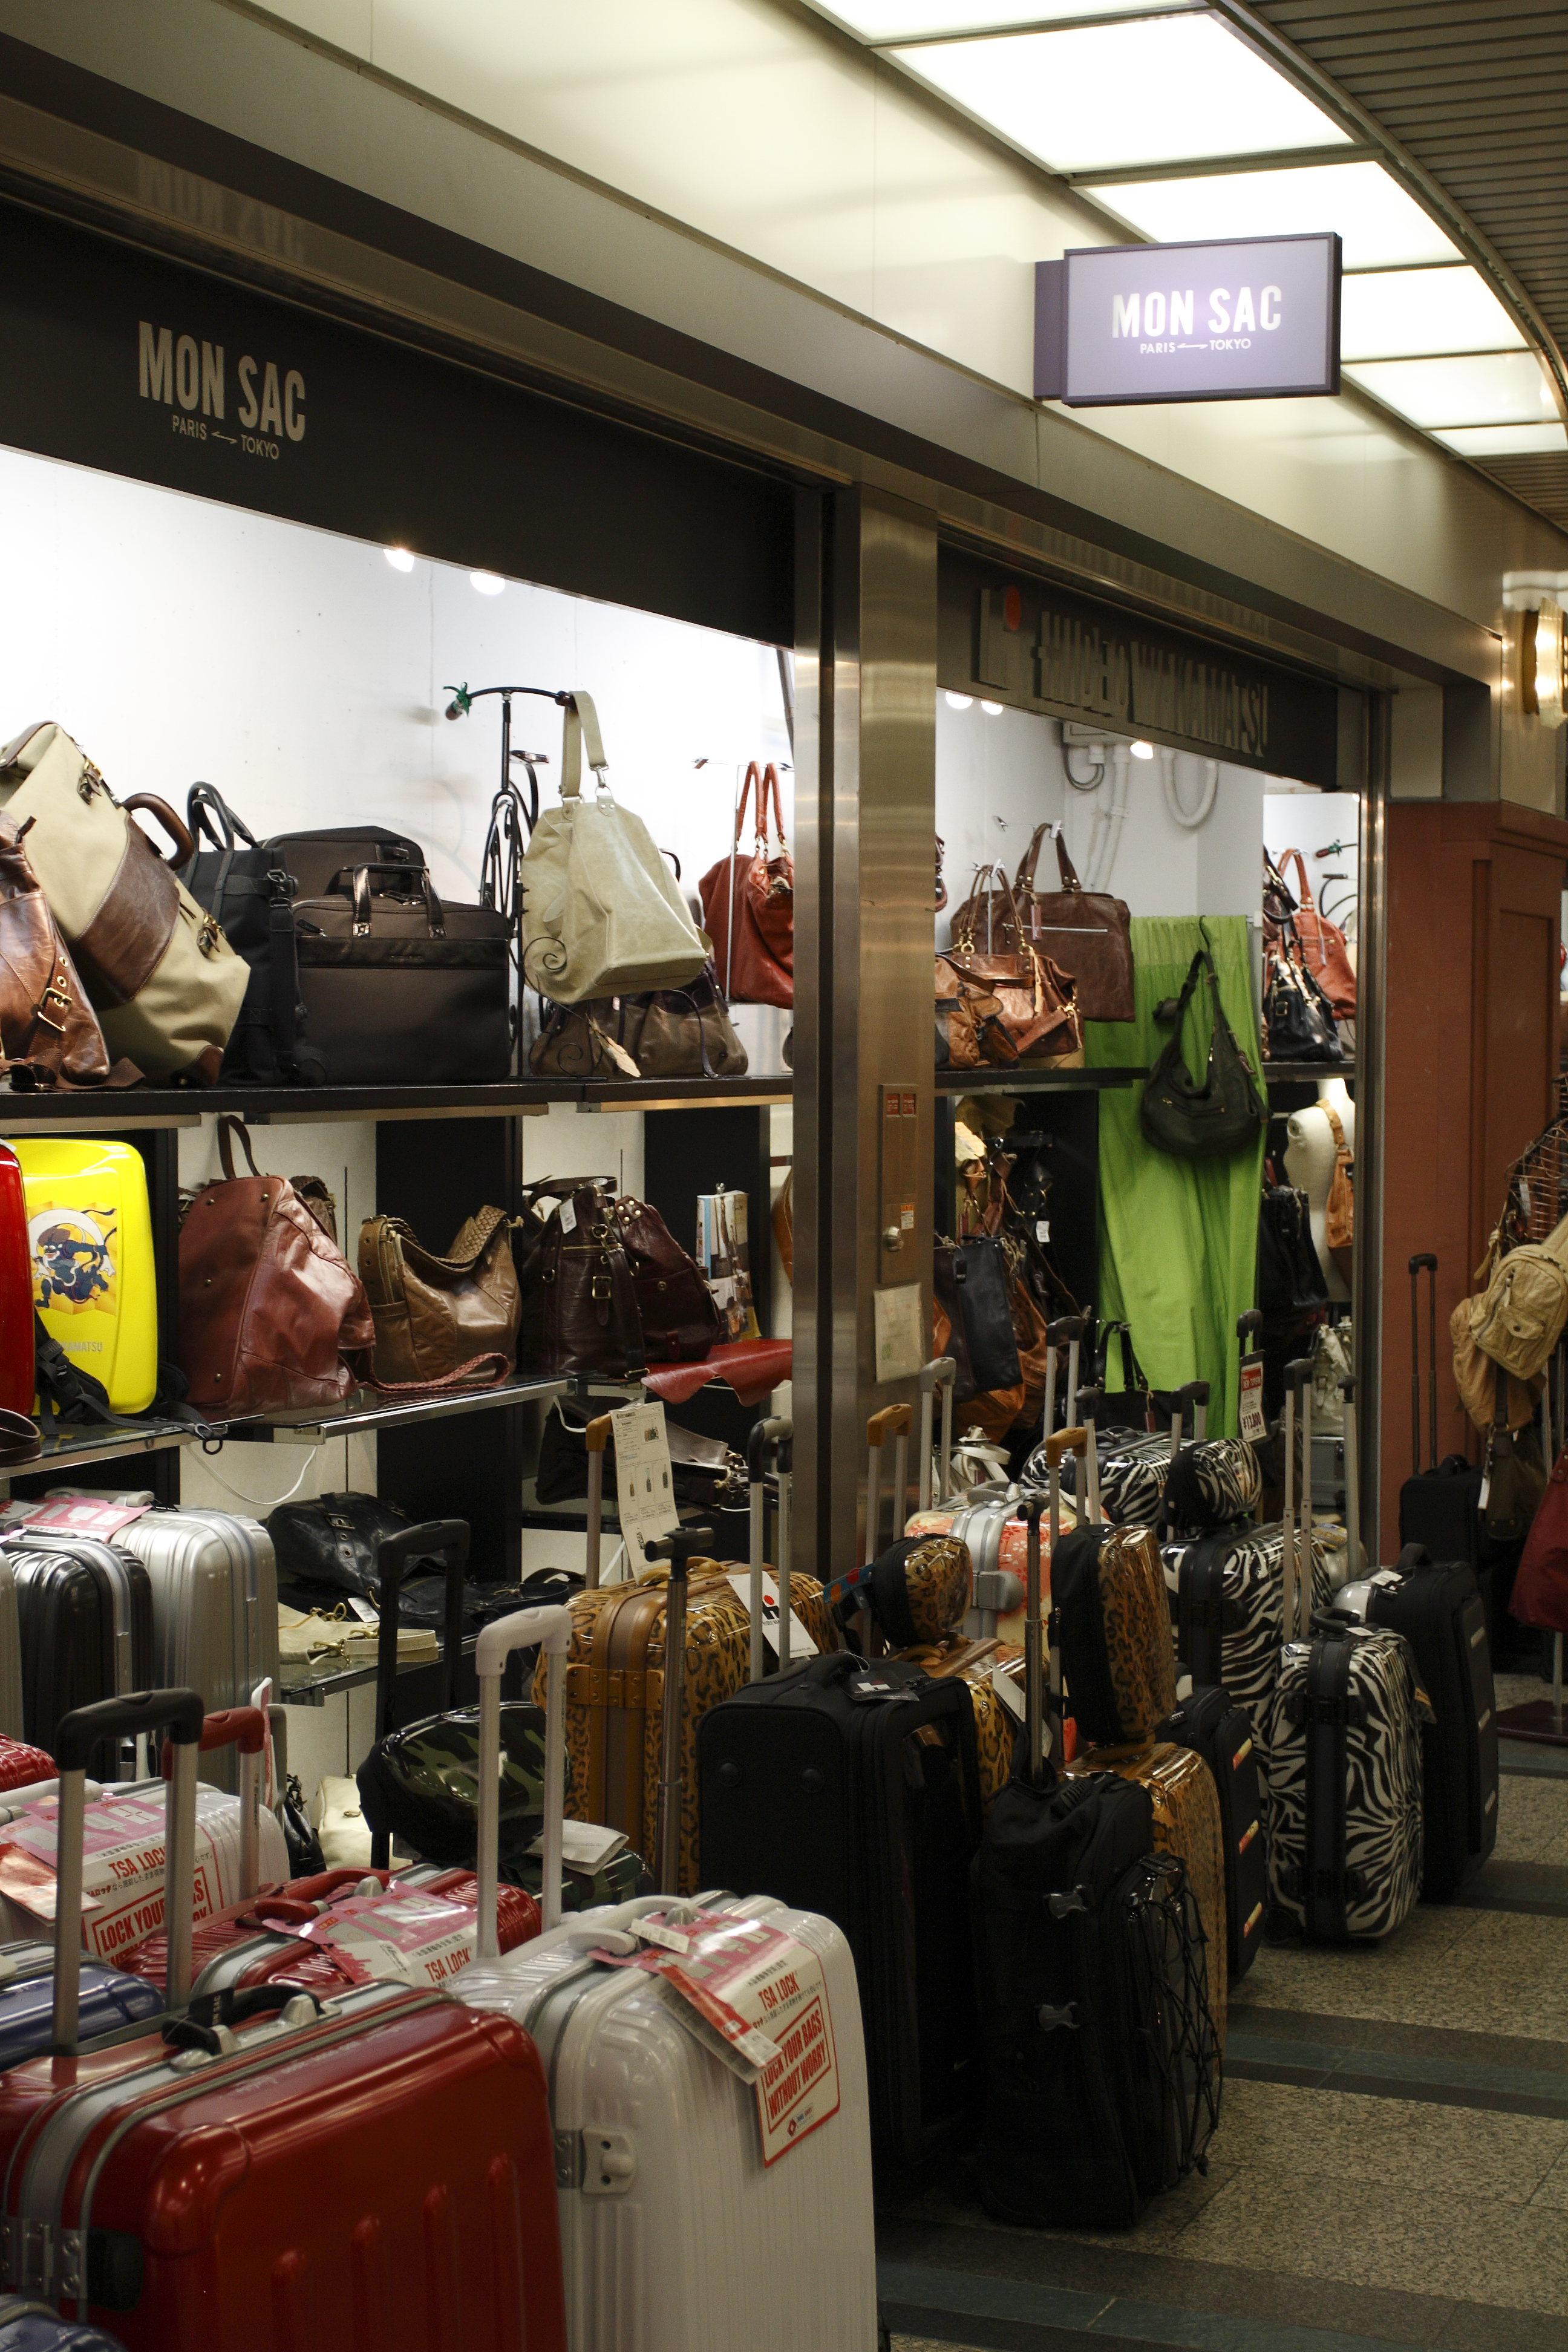 Mon sac Paris Tokyo